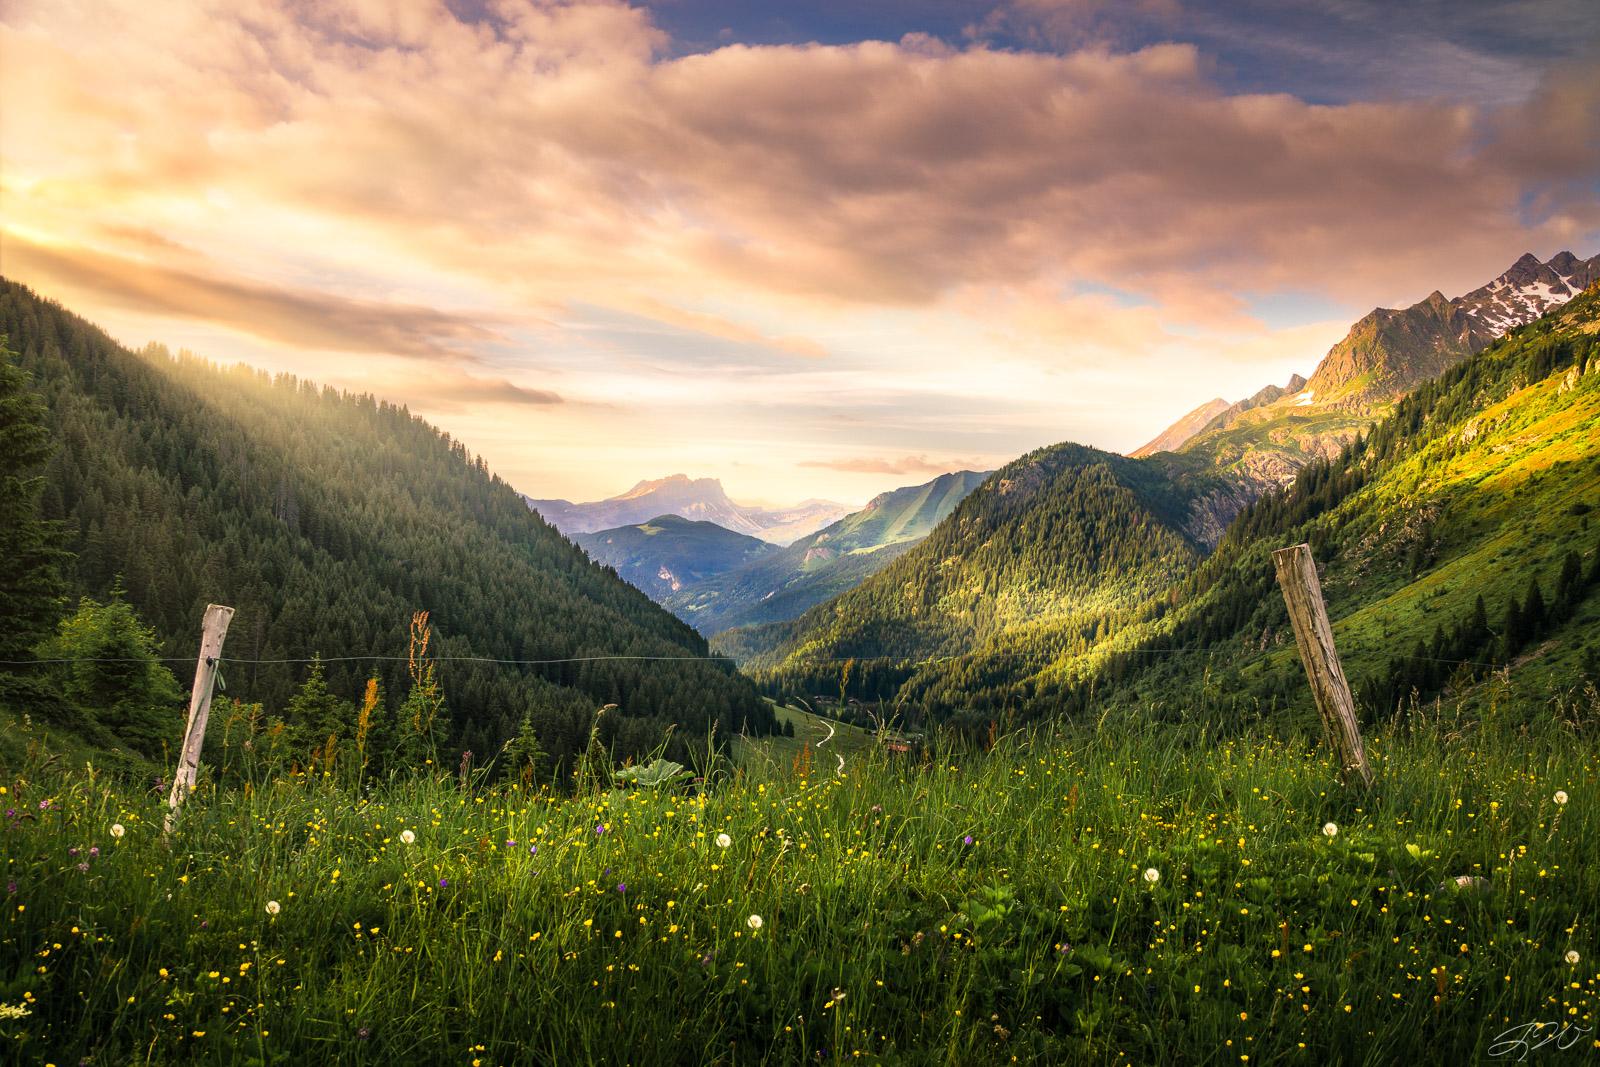 alps, europe, france, Italy, switzerland, mountains, sunset, tour du mont blanc, wildflowers, flowers, photo